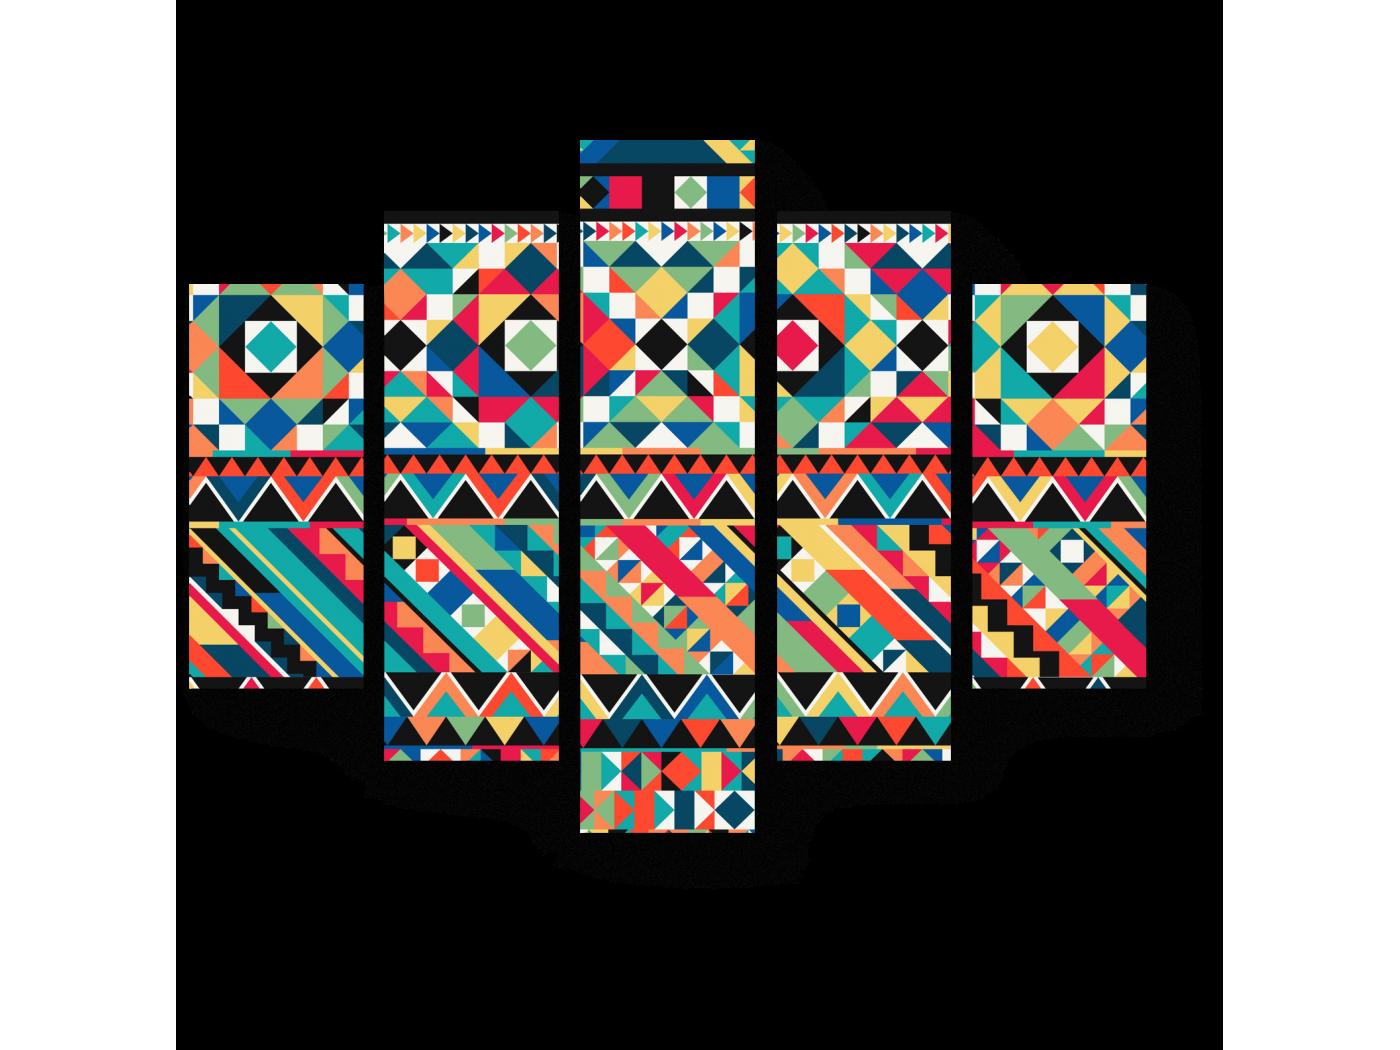 Модульная картина Мозаичная геометрия (75x60) фото